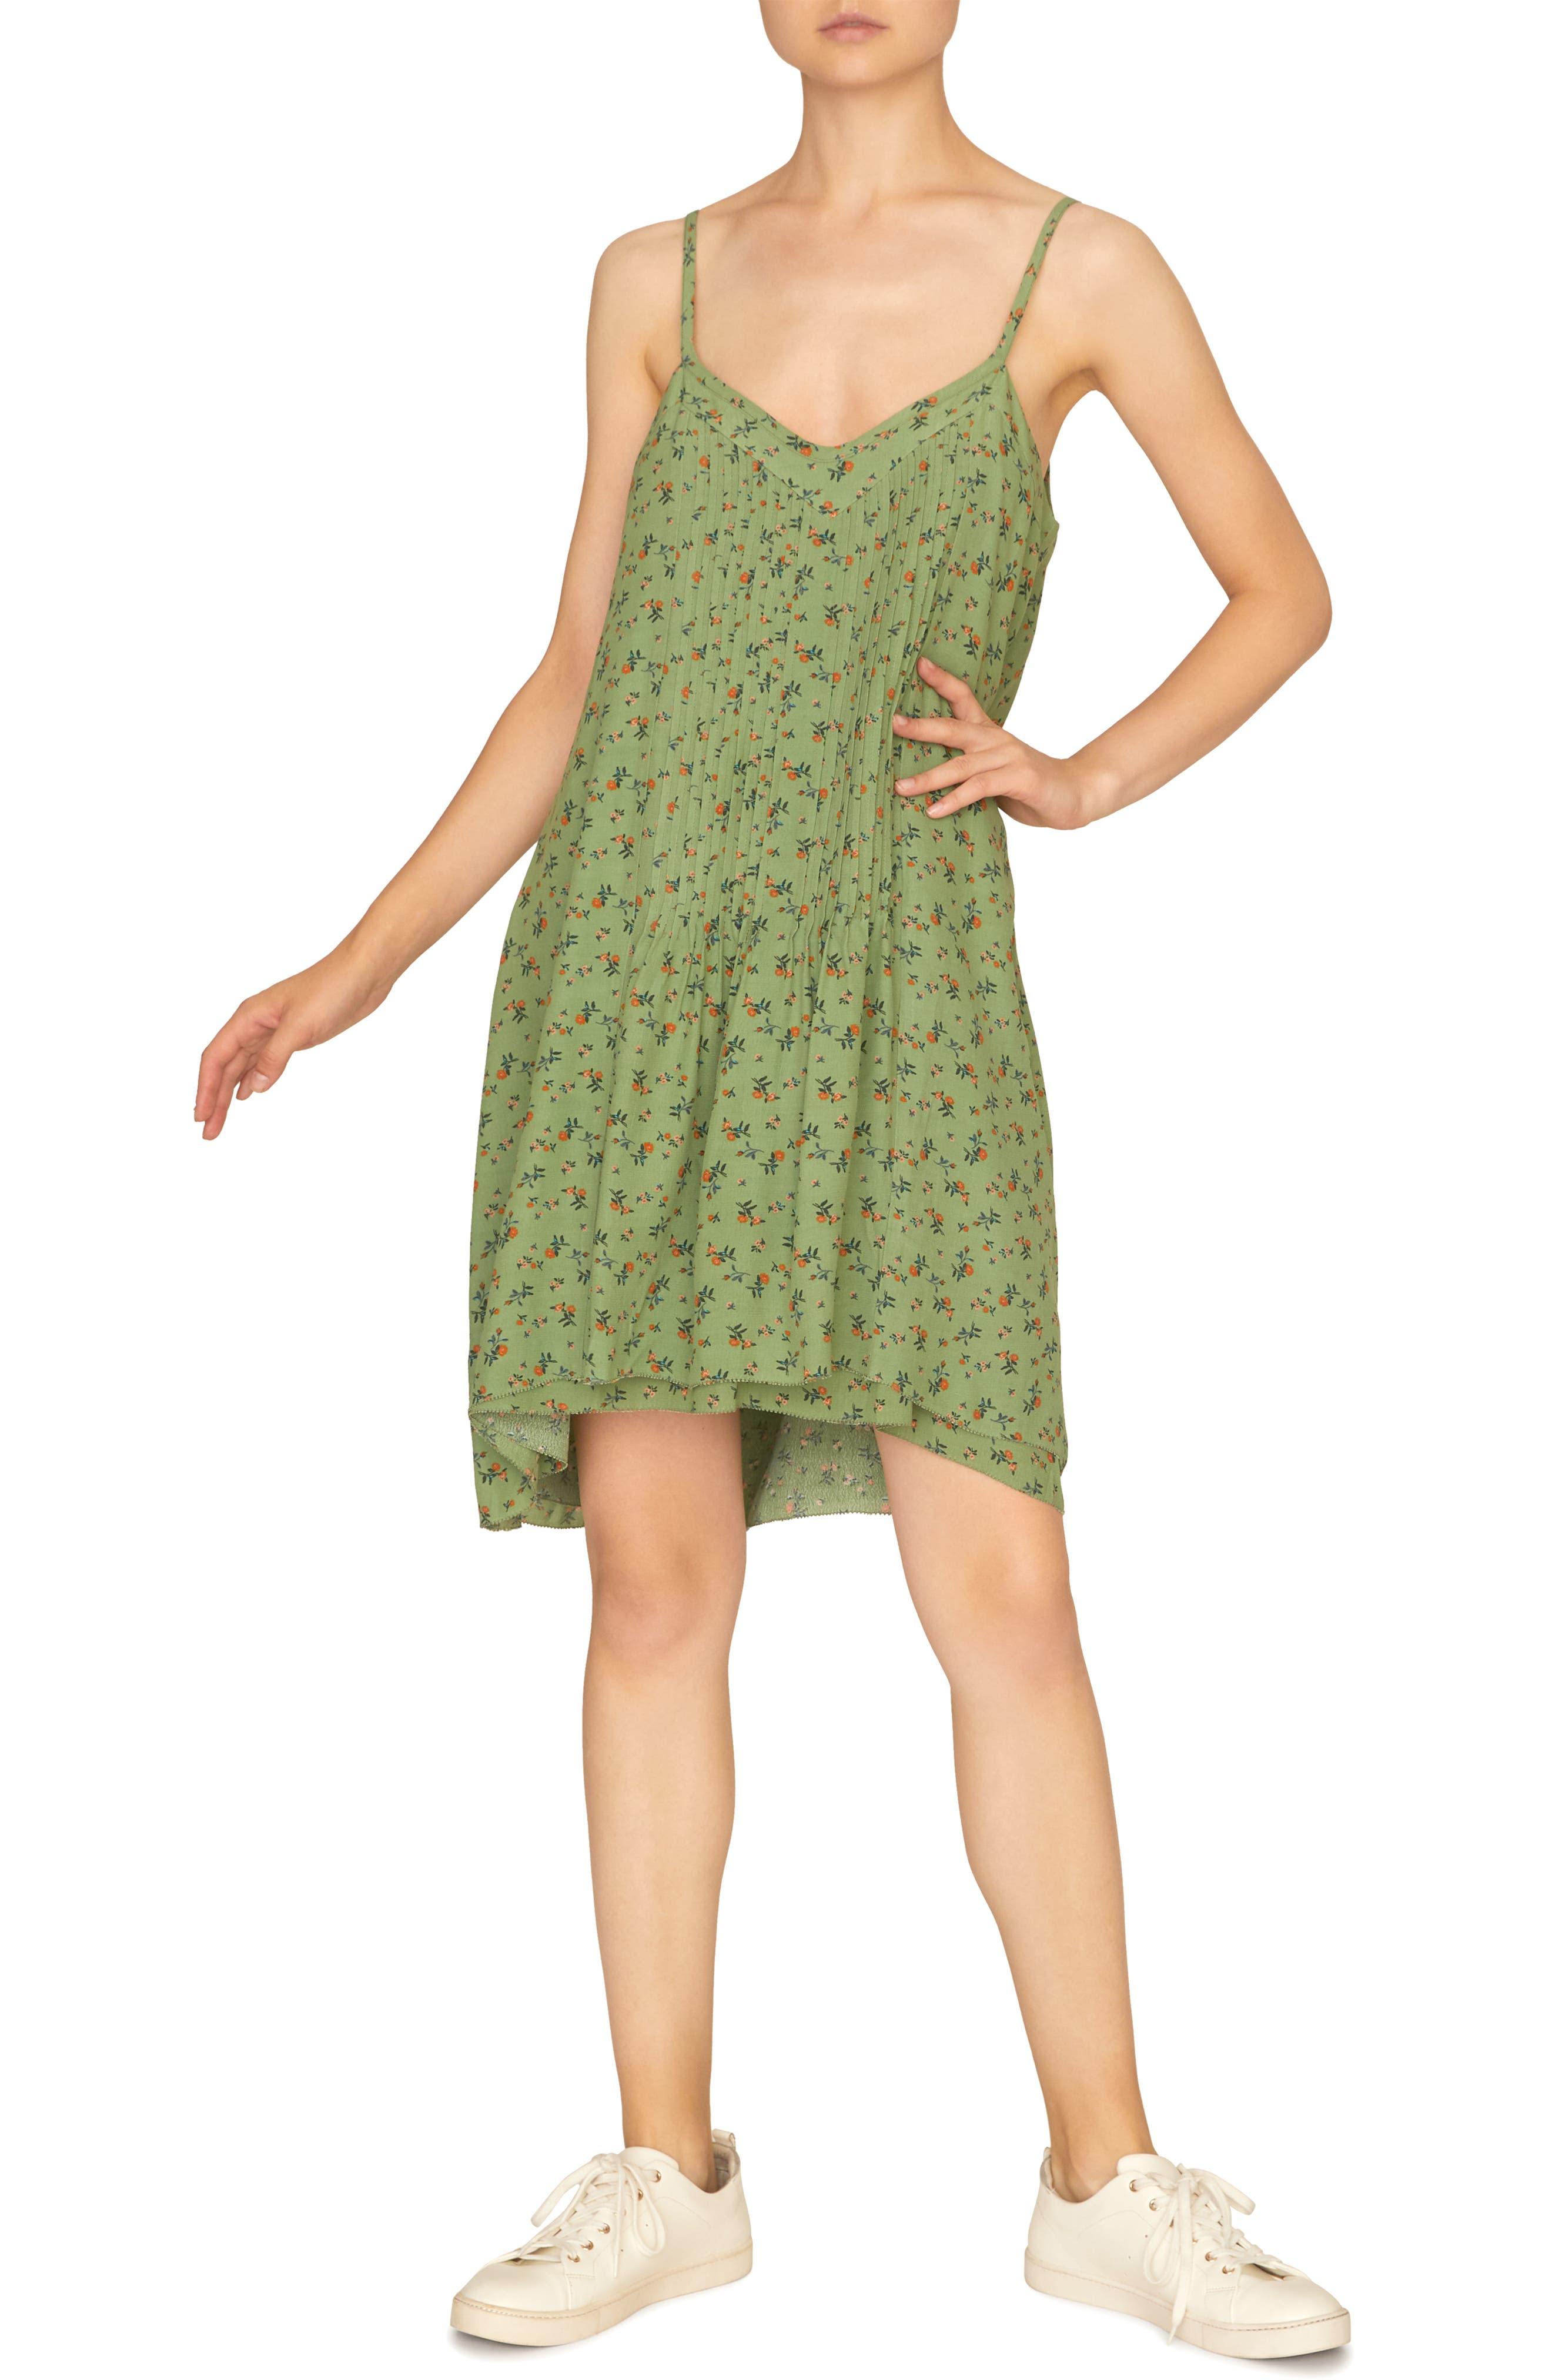 Sanctuary Spring Ahead Tank Dress, Green